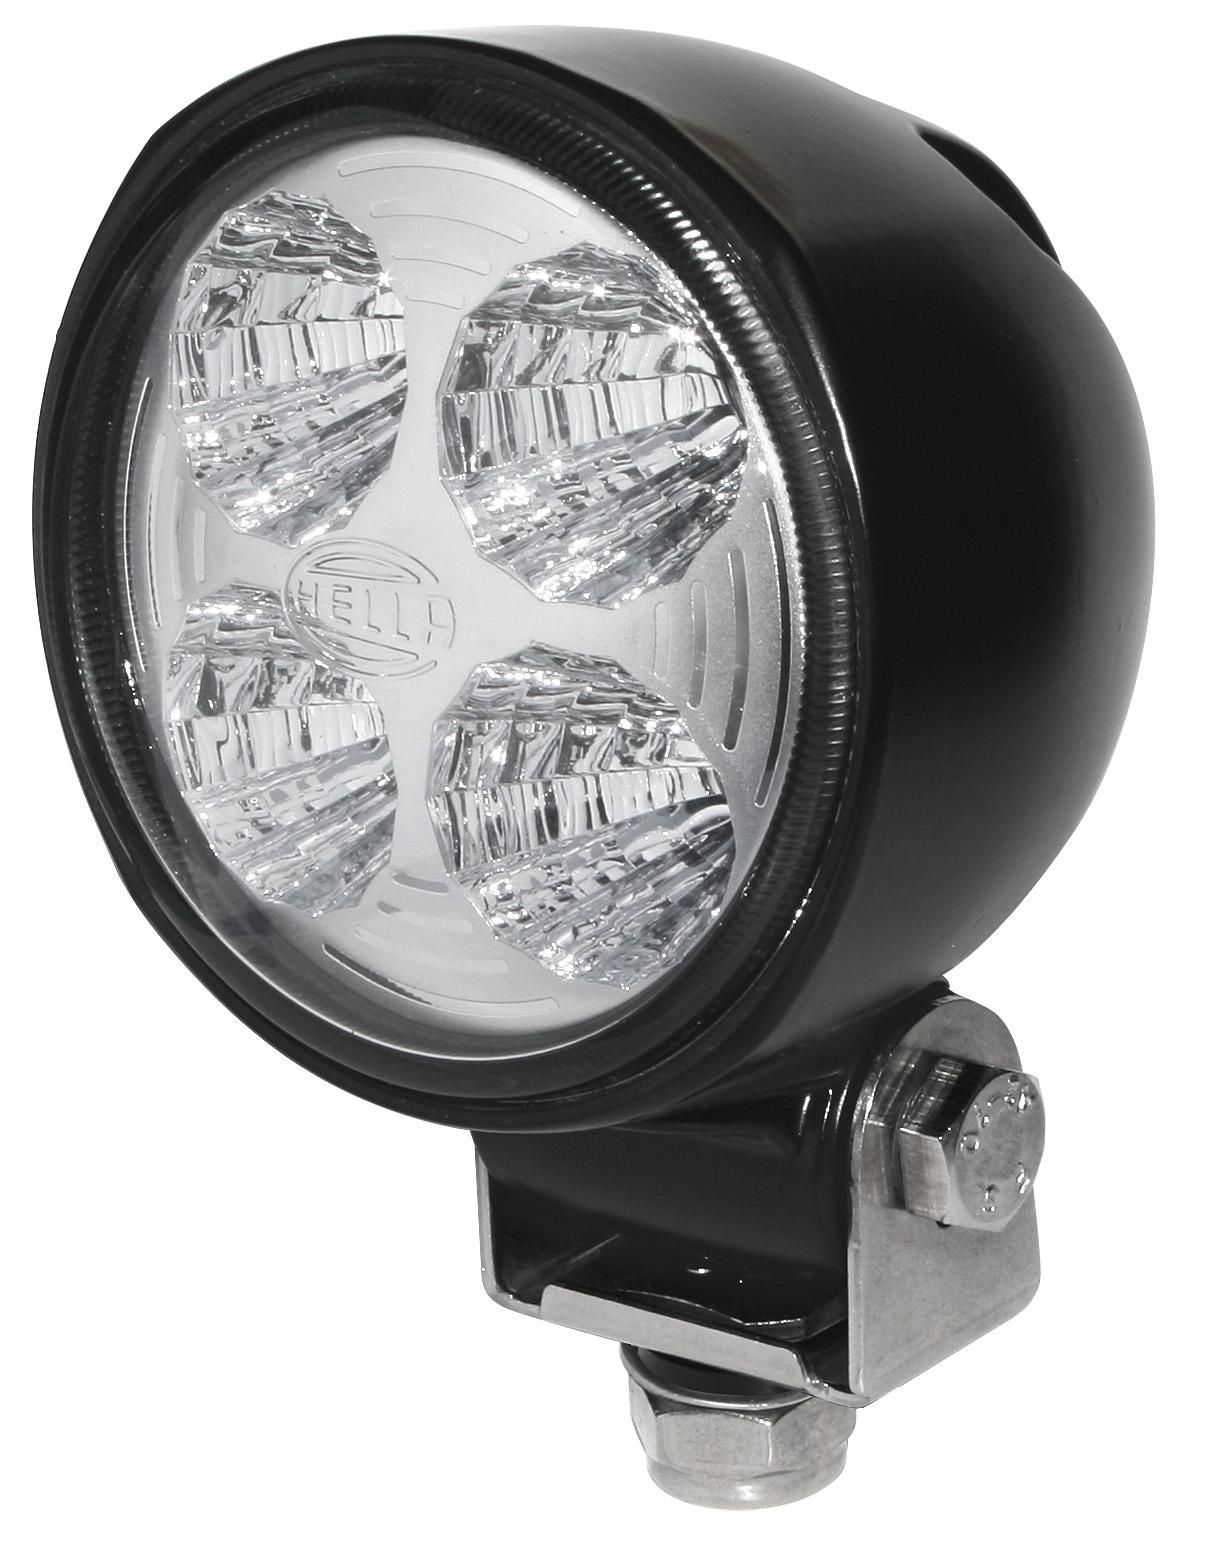 Deckscheinwerfer Hella Modul 70 LED